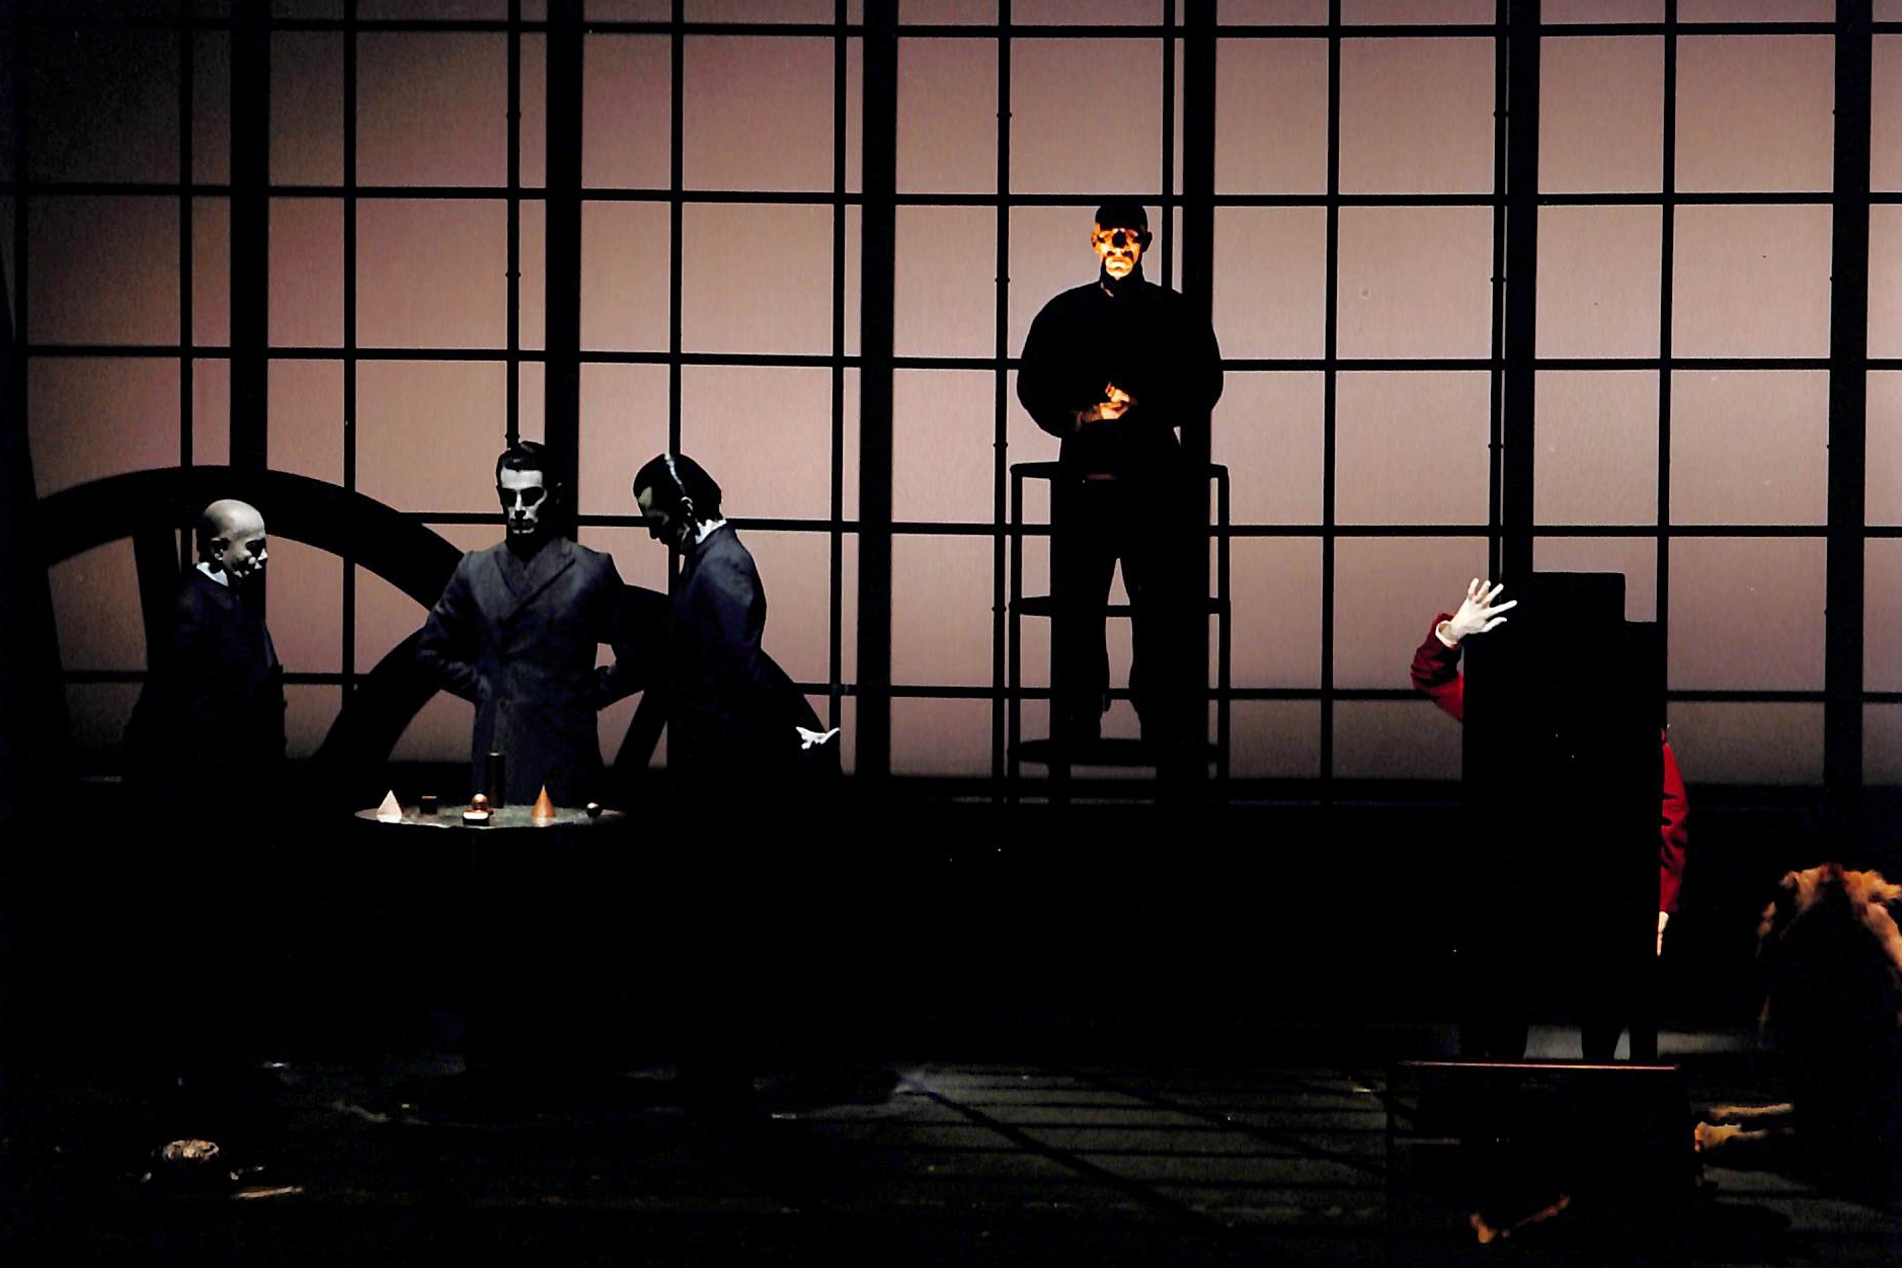 Act II - Simon Newby-Koschwitz, Jezy Milton, Martin Peter (3 Managers), Michel Honesseau (Foreman), Martin Wuttke (Gilgamesh)